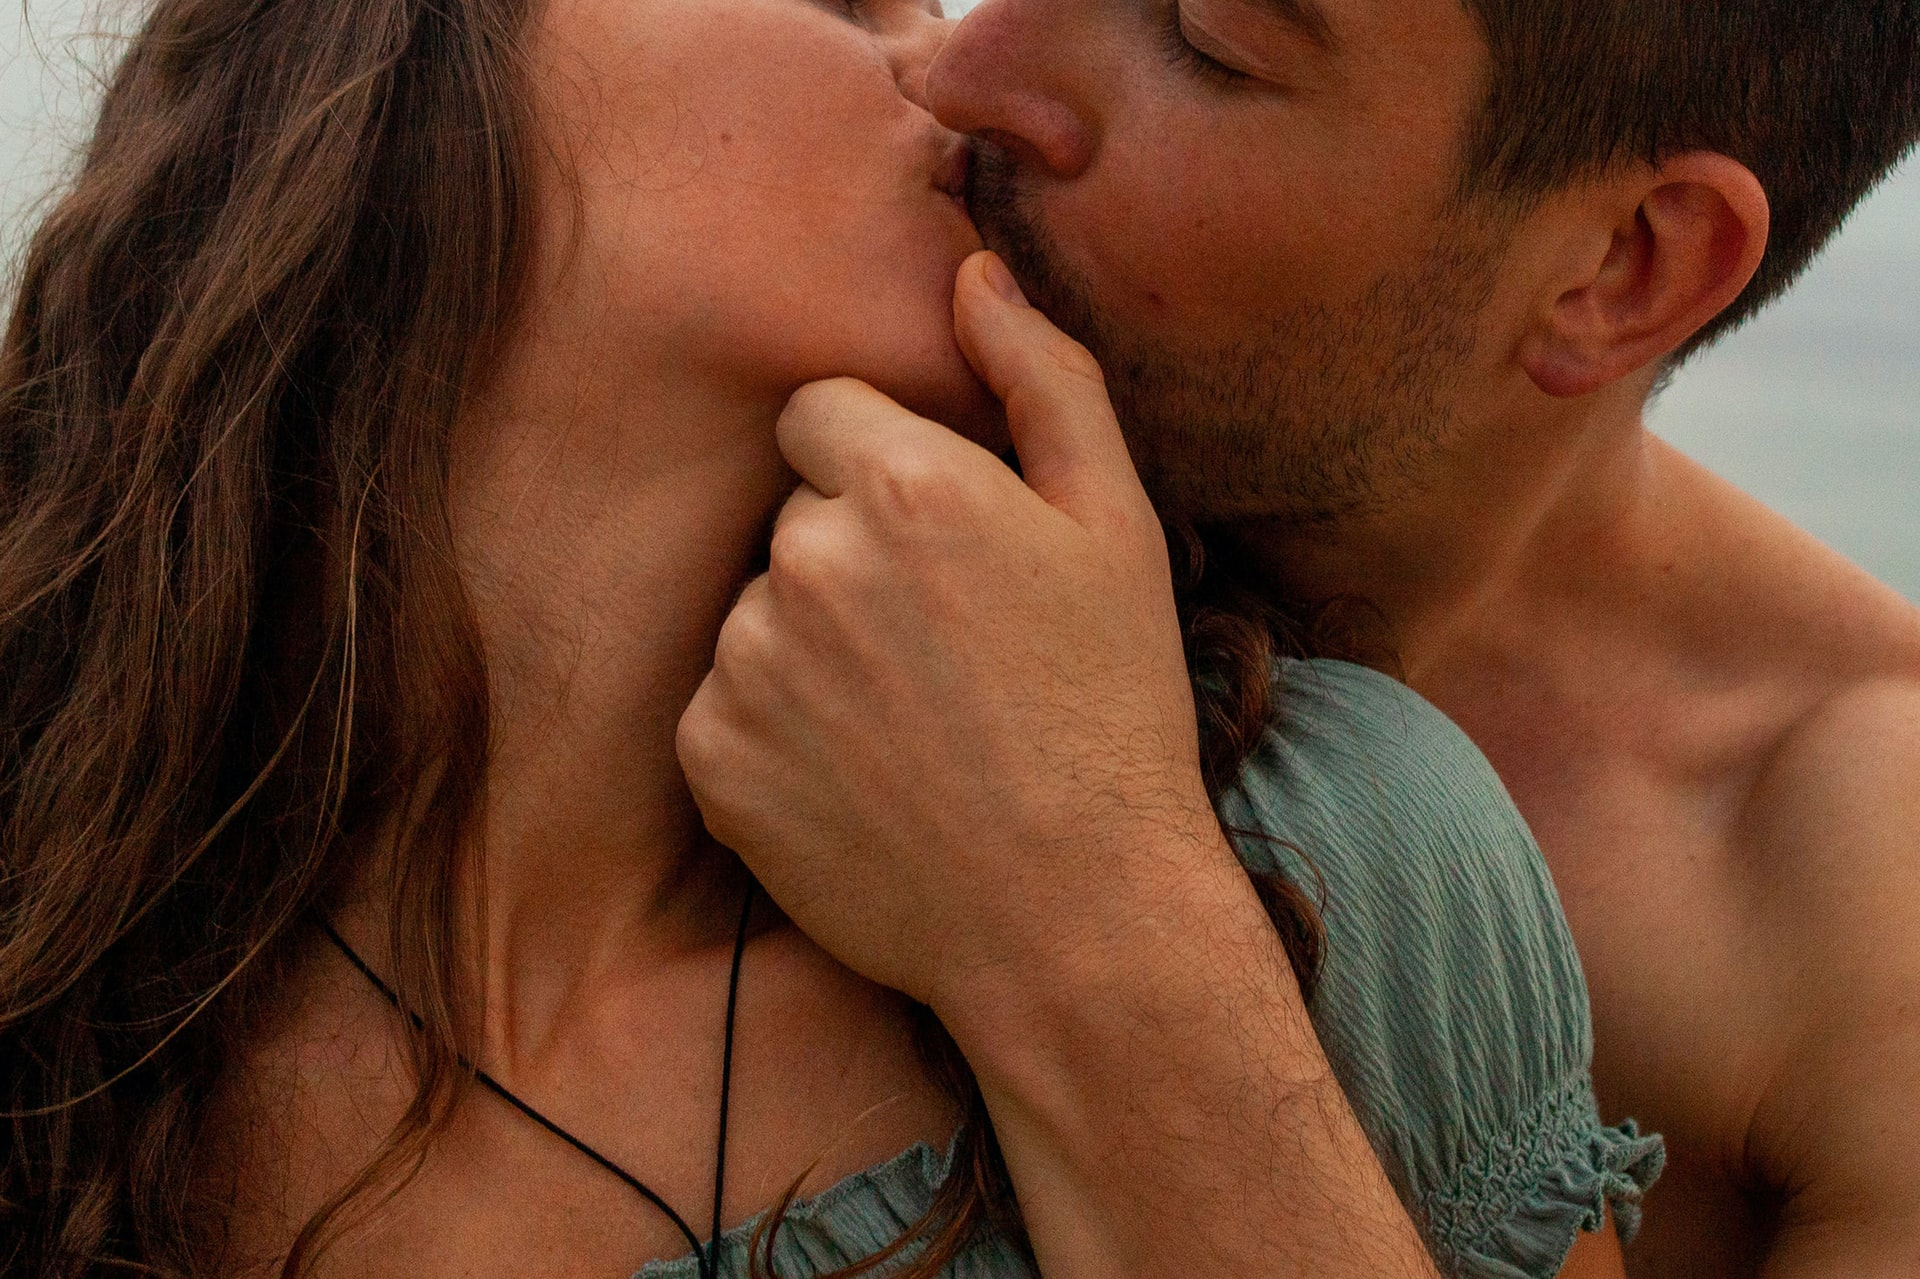 pareja besandose apasionadamente